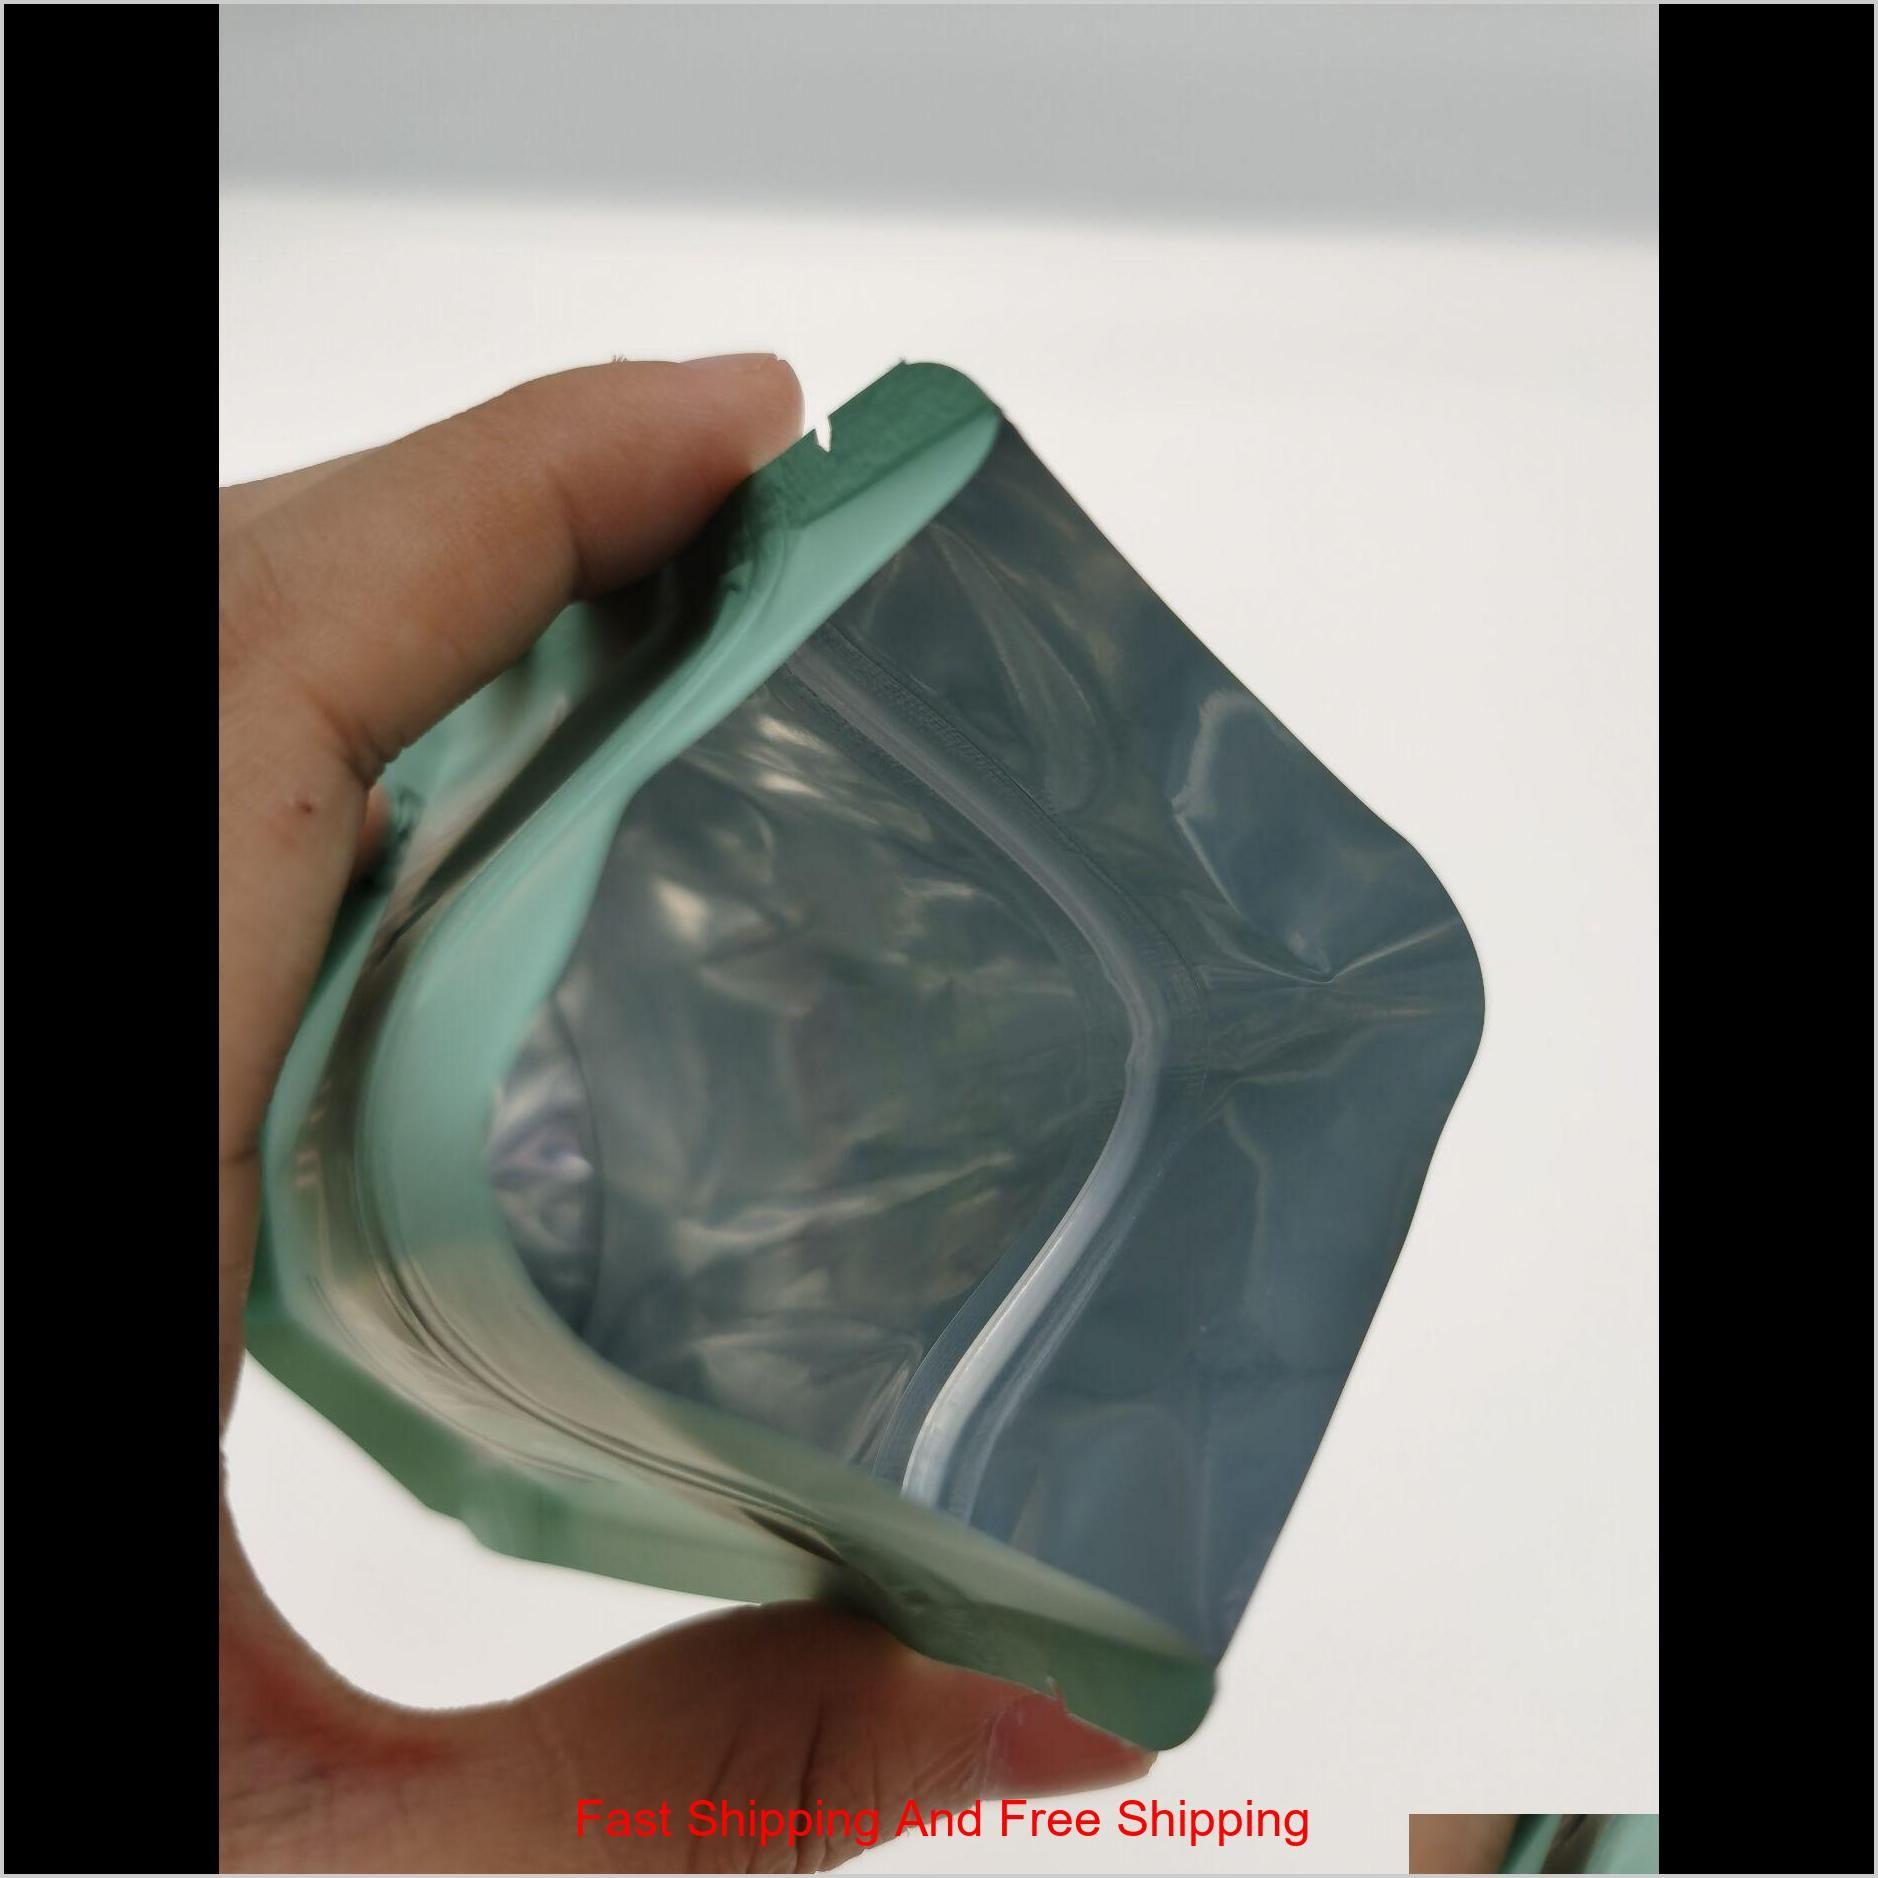 110x170 backpack boyz christmas santa claus smell proof bags local 3.5g mylar bags empty bag wmtckp